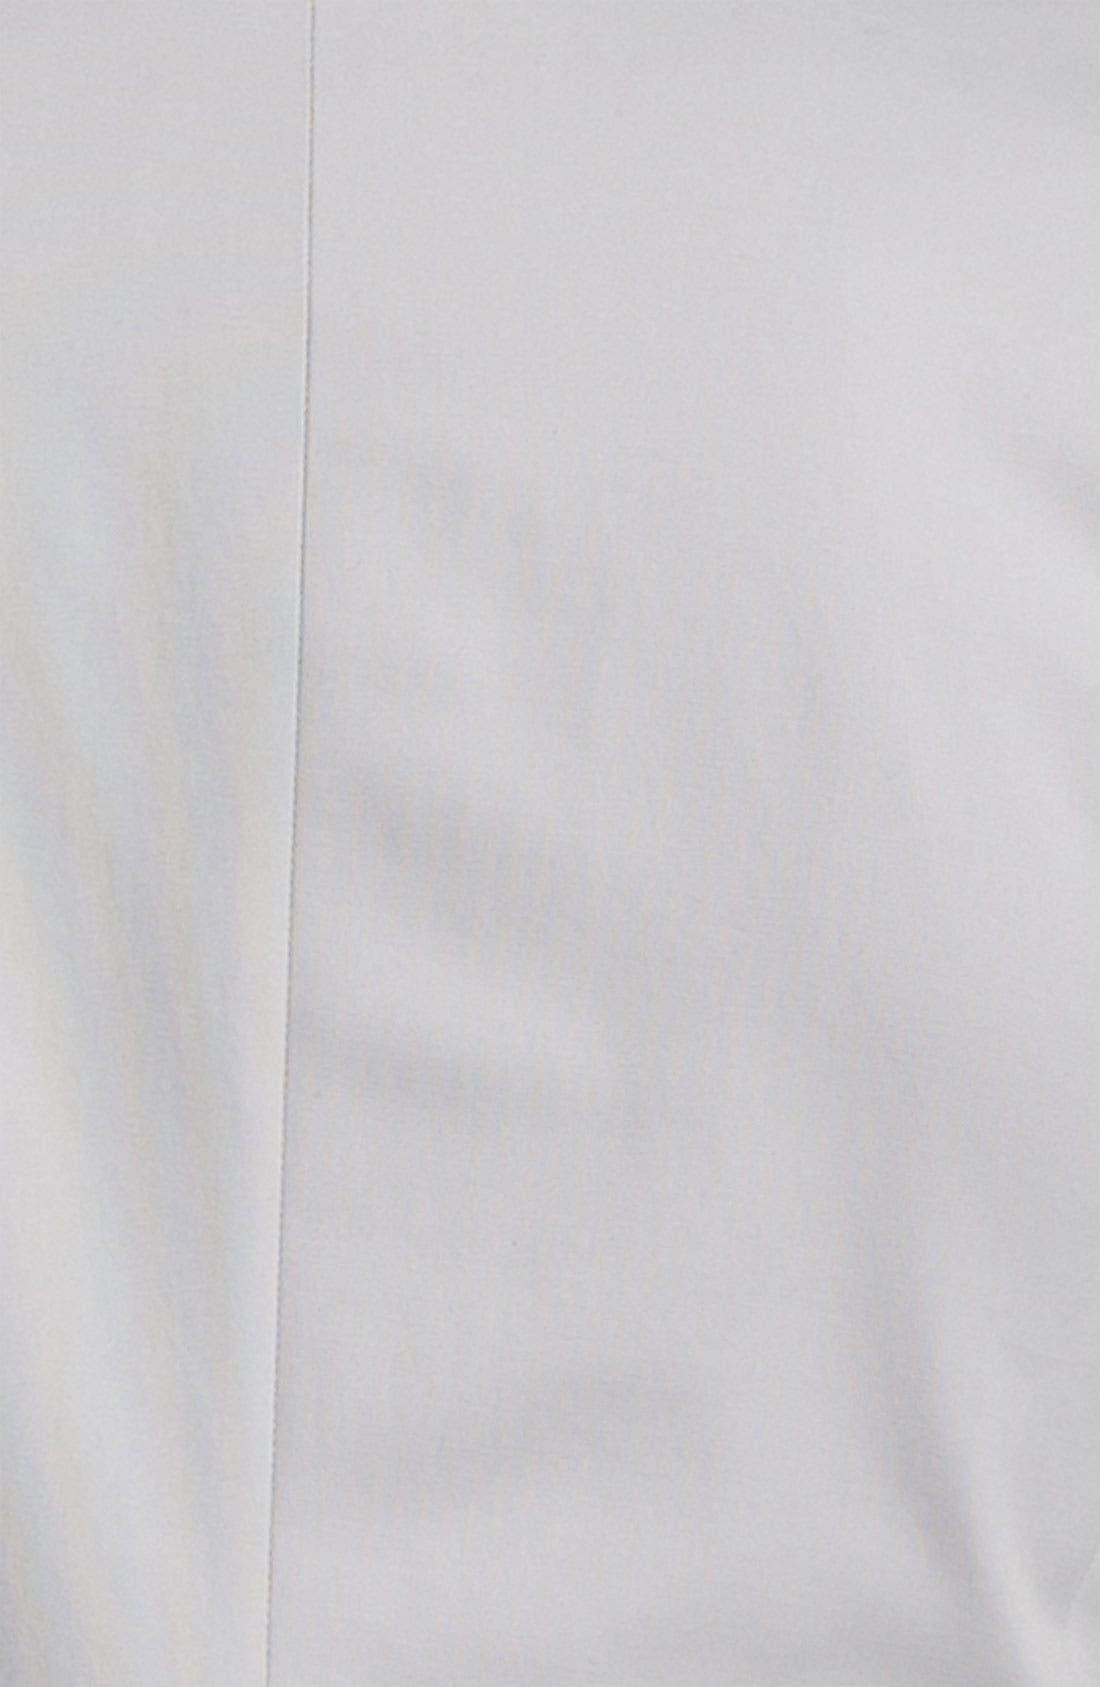 ZZDNUHUGO BOSS, HUGO 'Aeris' Trim Fit Cotton Blend Blazer, Alternate thumbnail 4, color, 030